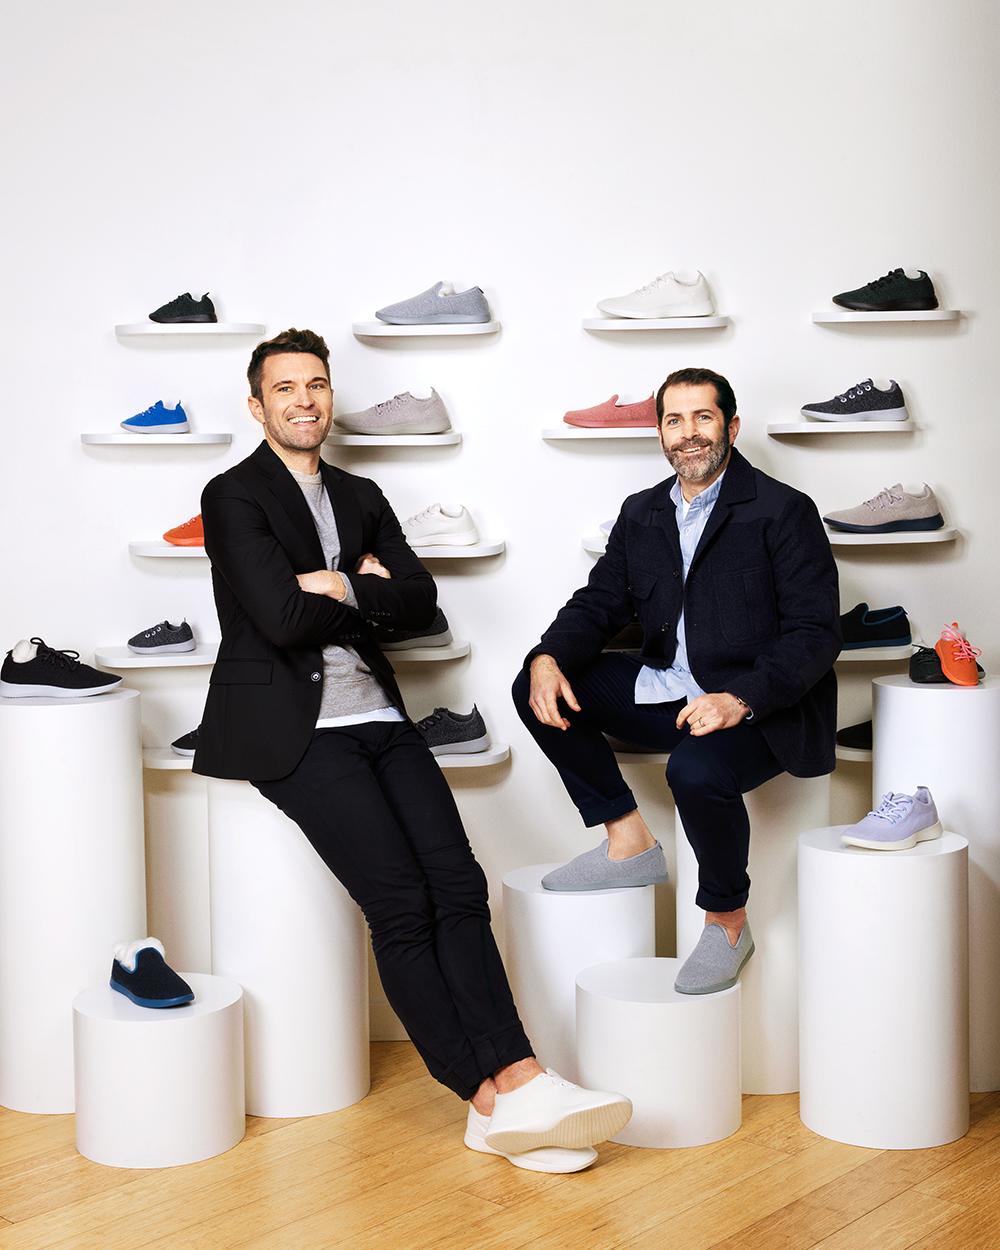 shoe-image